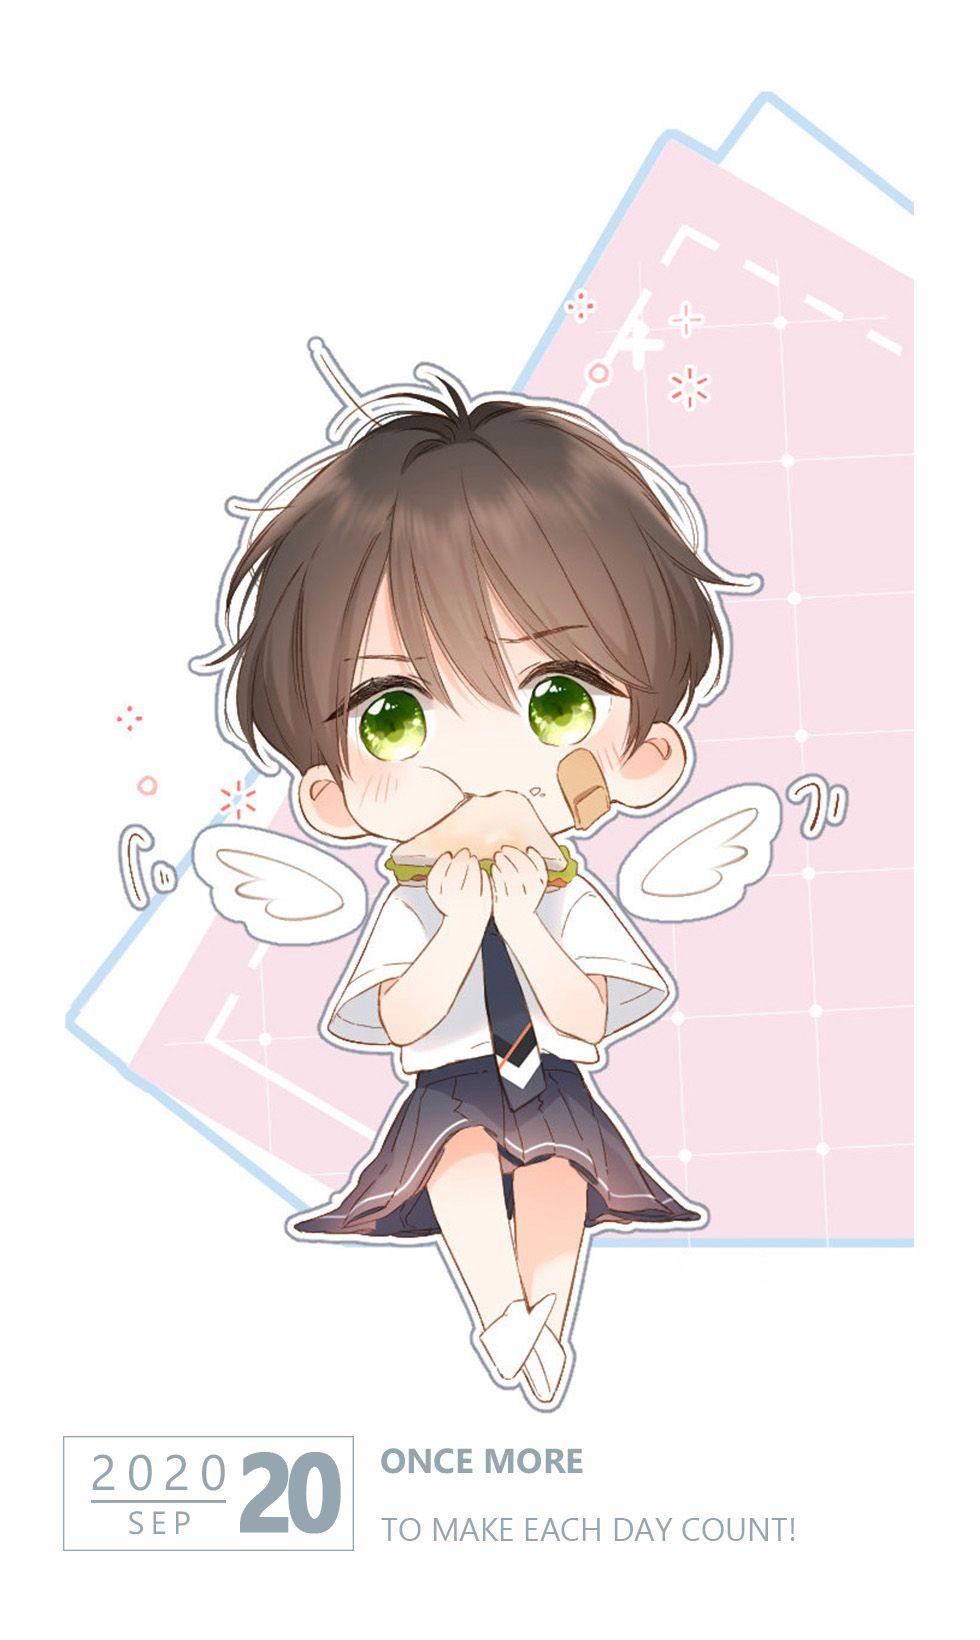 WebComics App | Chibi anime kawaii, Cute anime chibi, Anime chibi